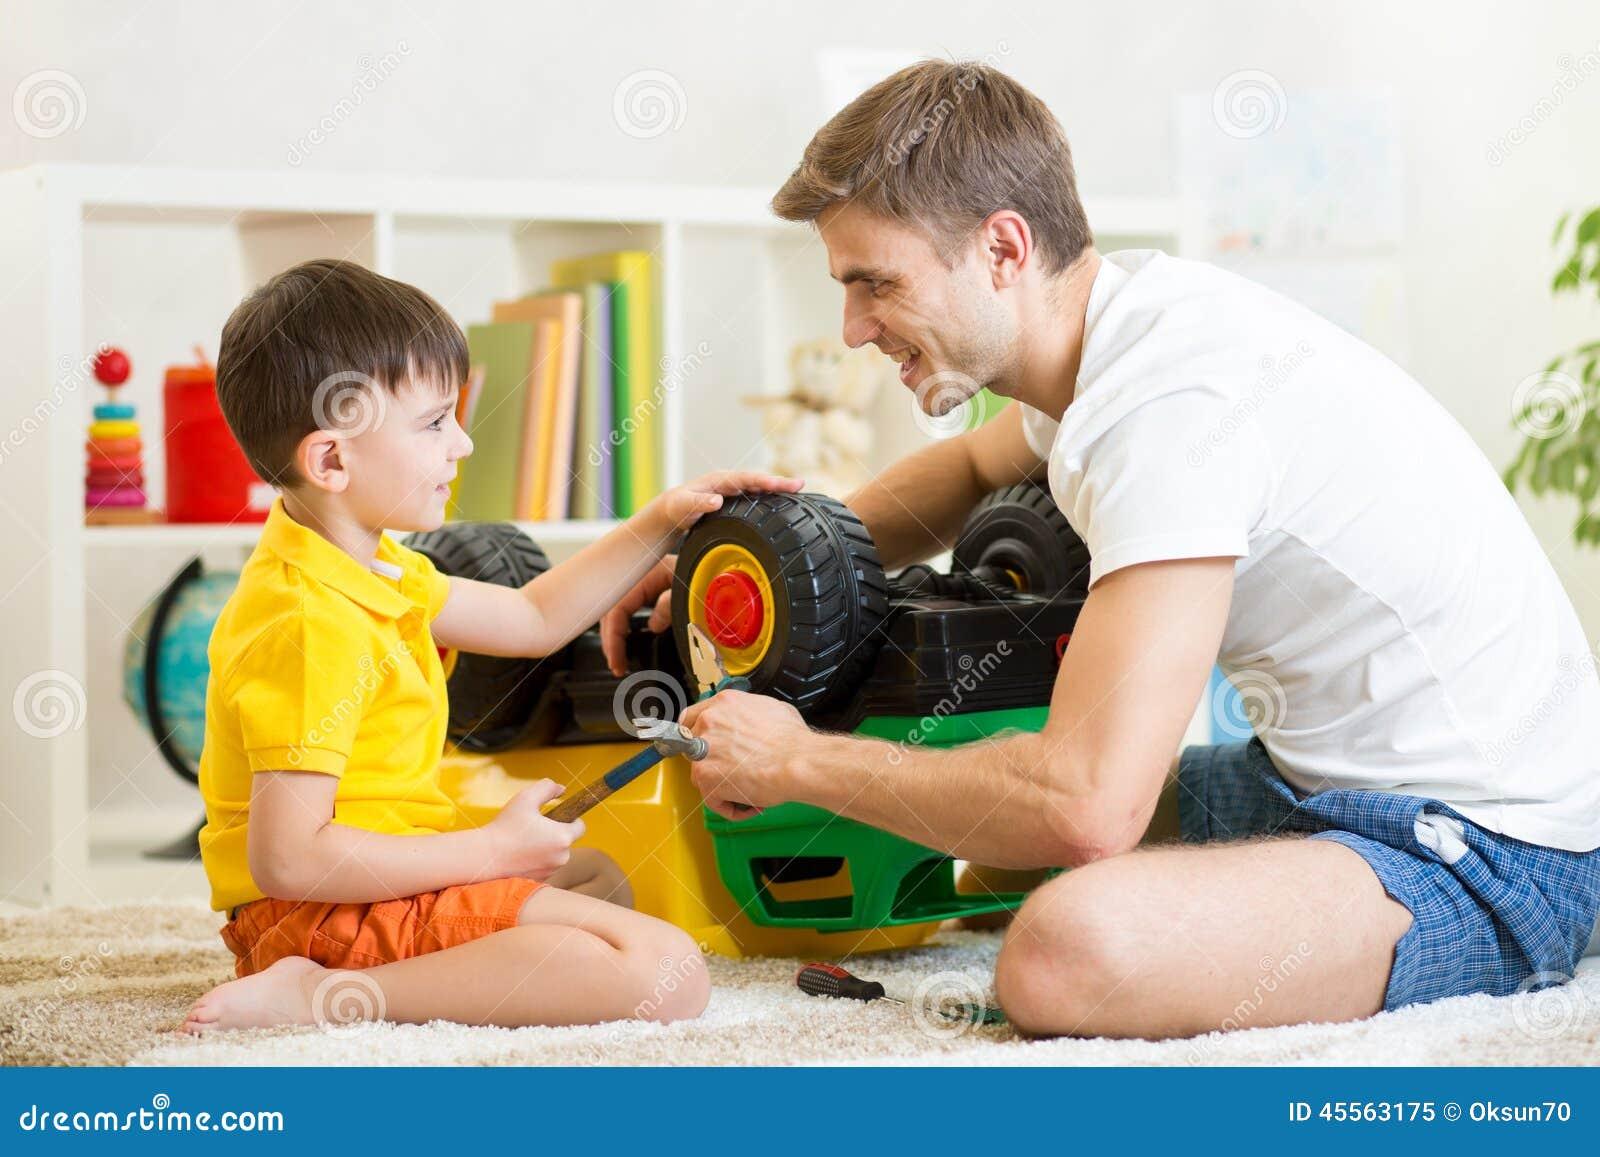 Toys For Dads : Boy dad images usseek